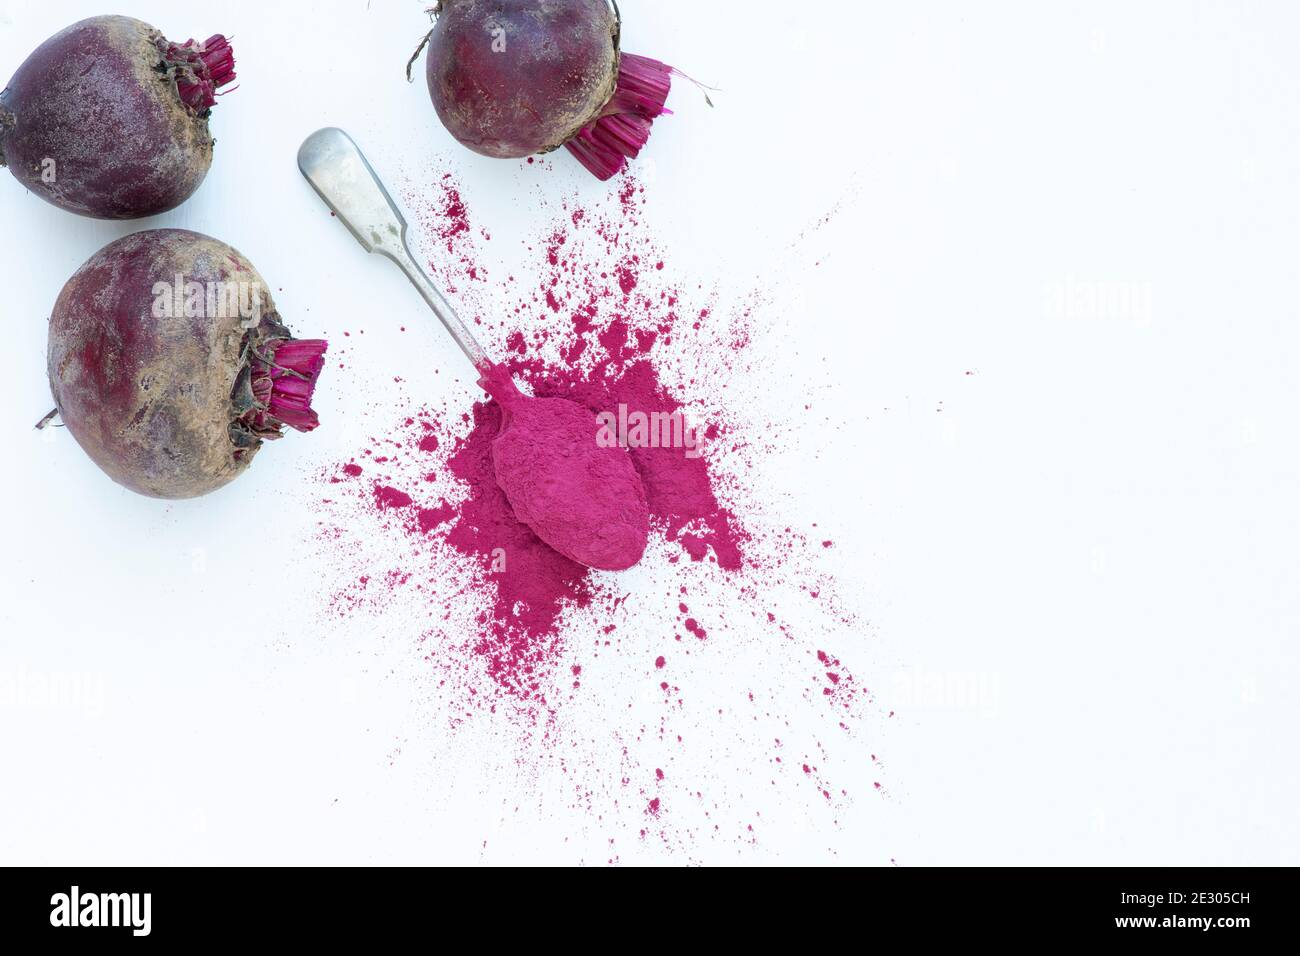 Beta vulgaris. Beetroot powder and beetroots Stock Photo